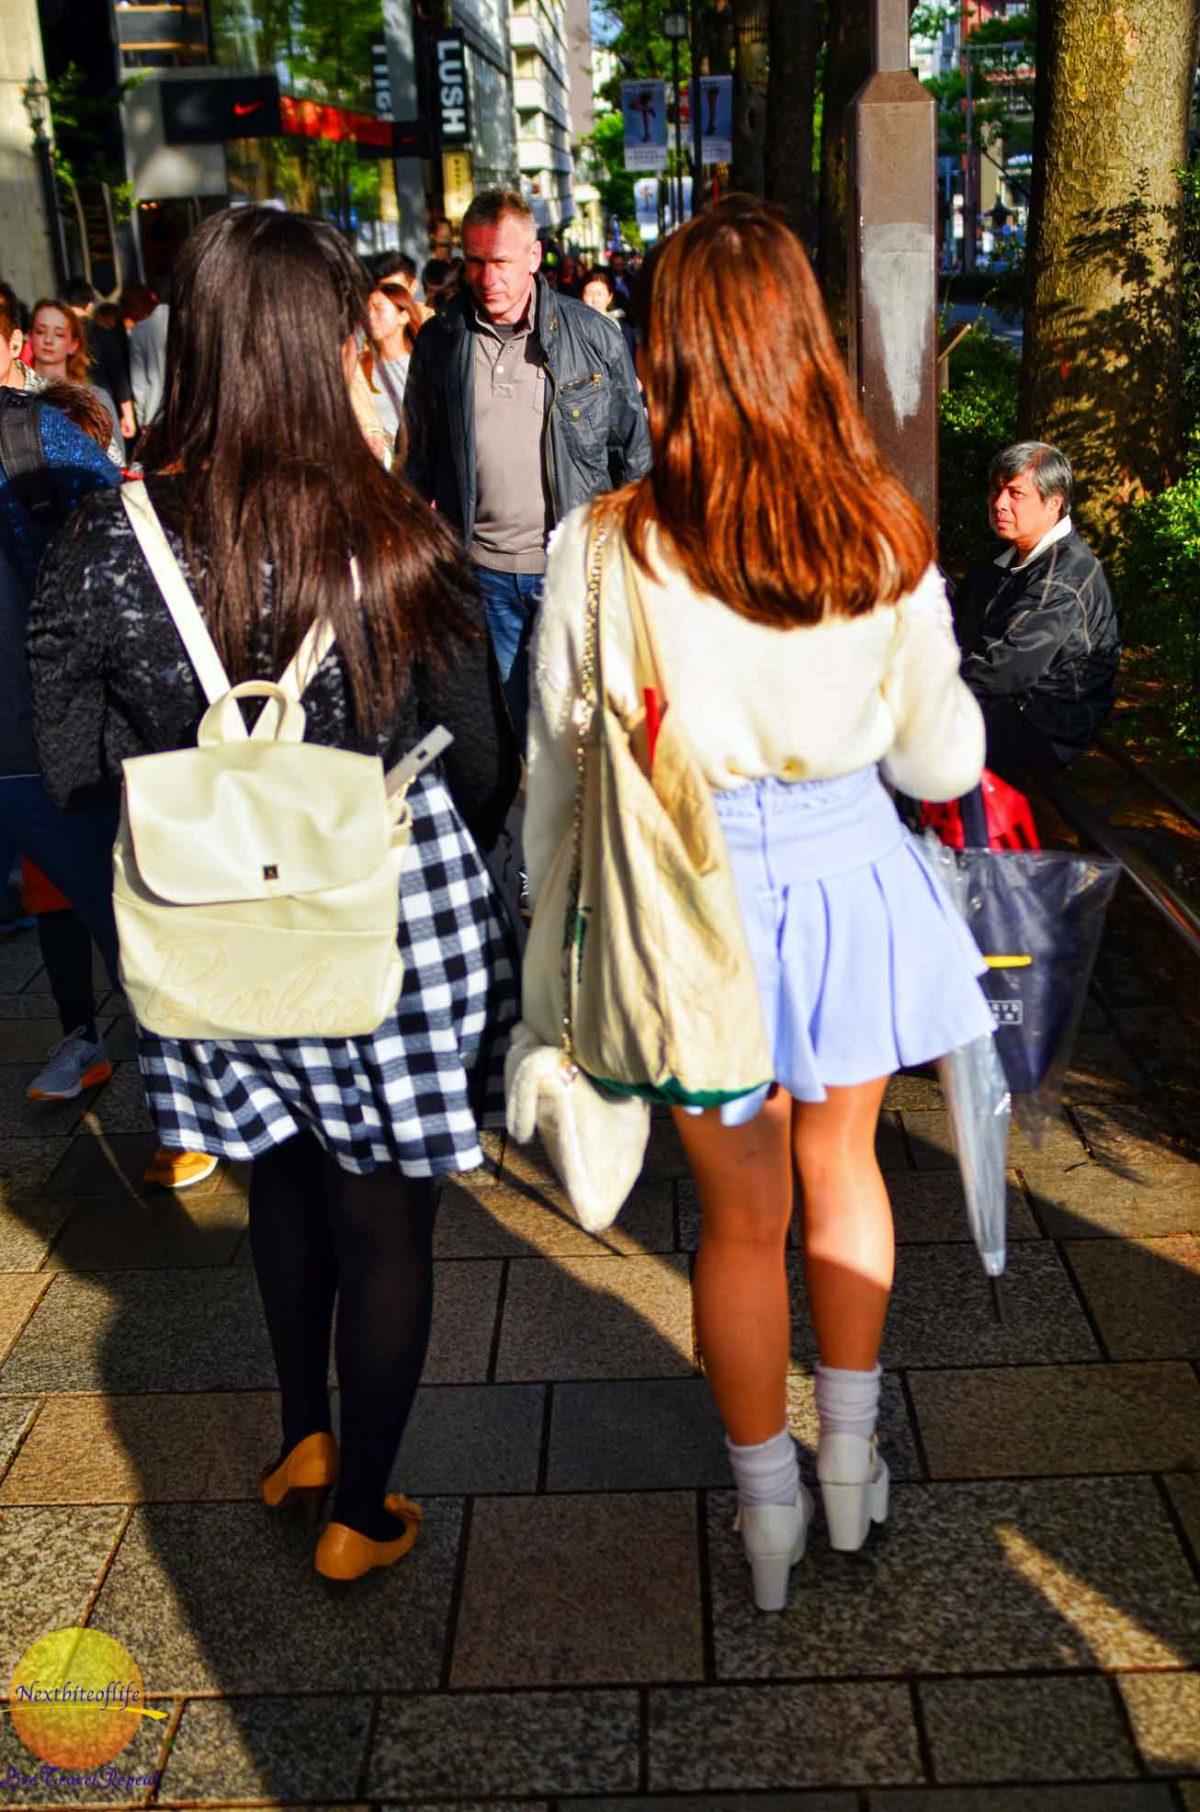 Harajuku girls enjoying their day. #tokyo #japan #harajuku #japan